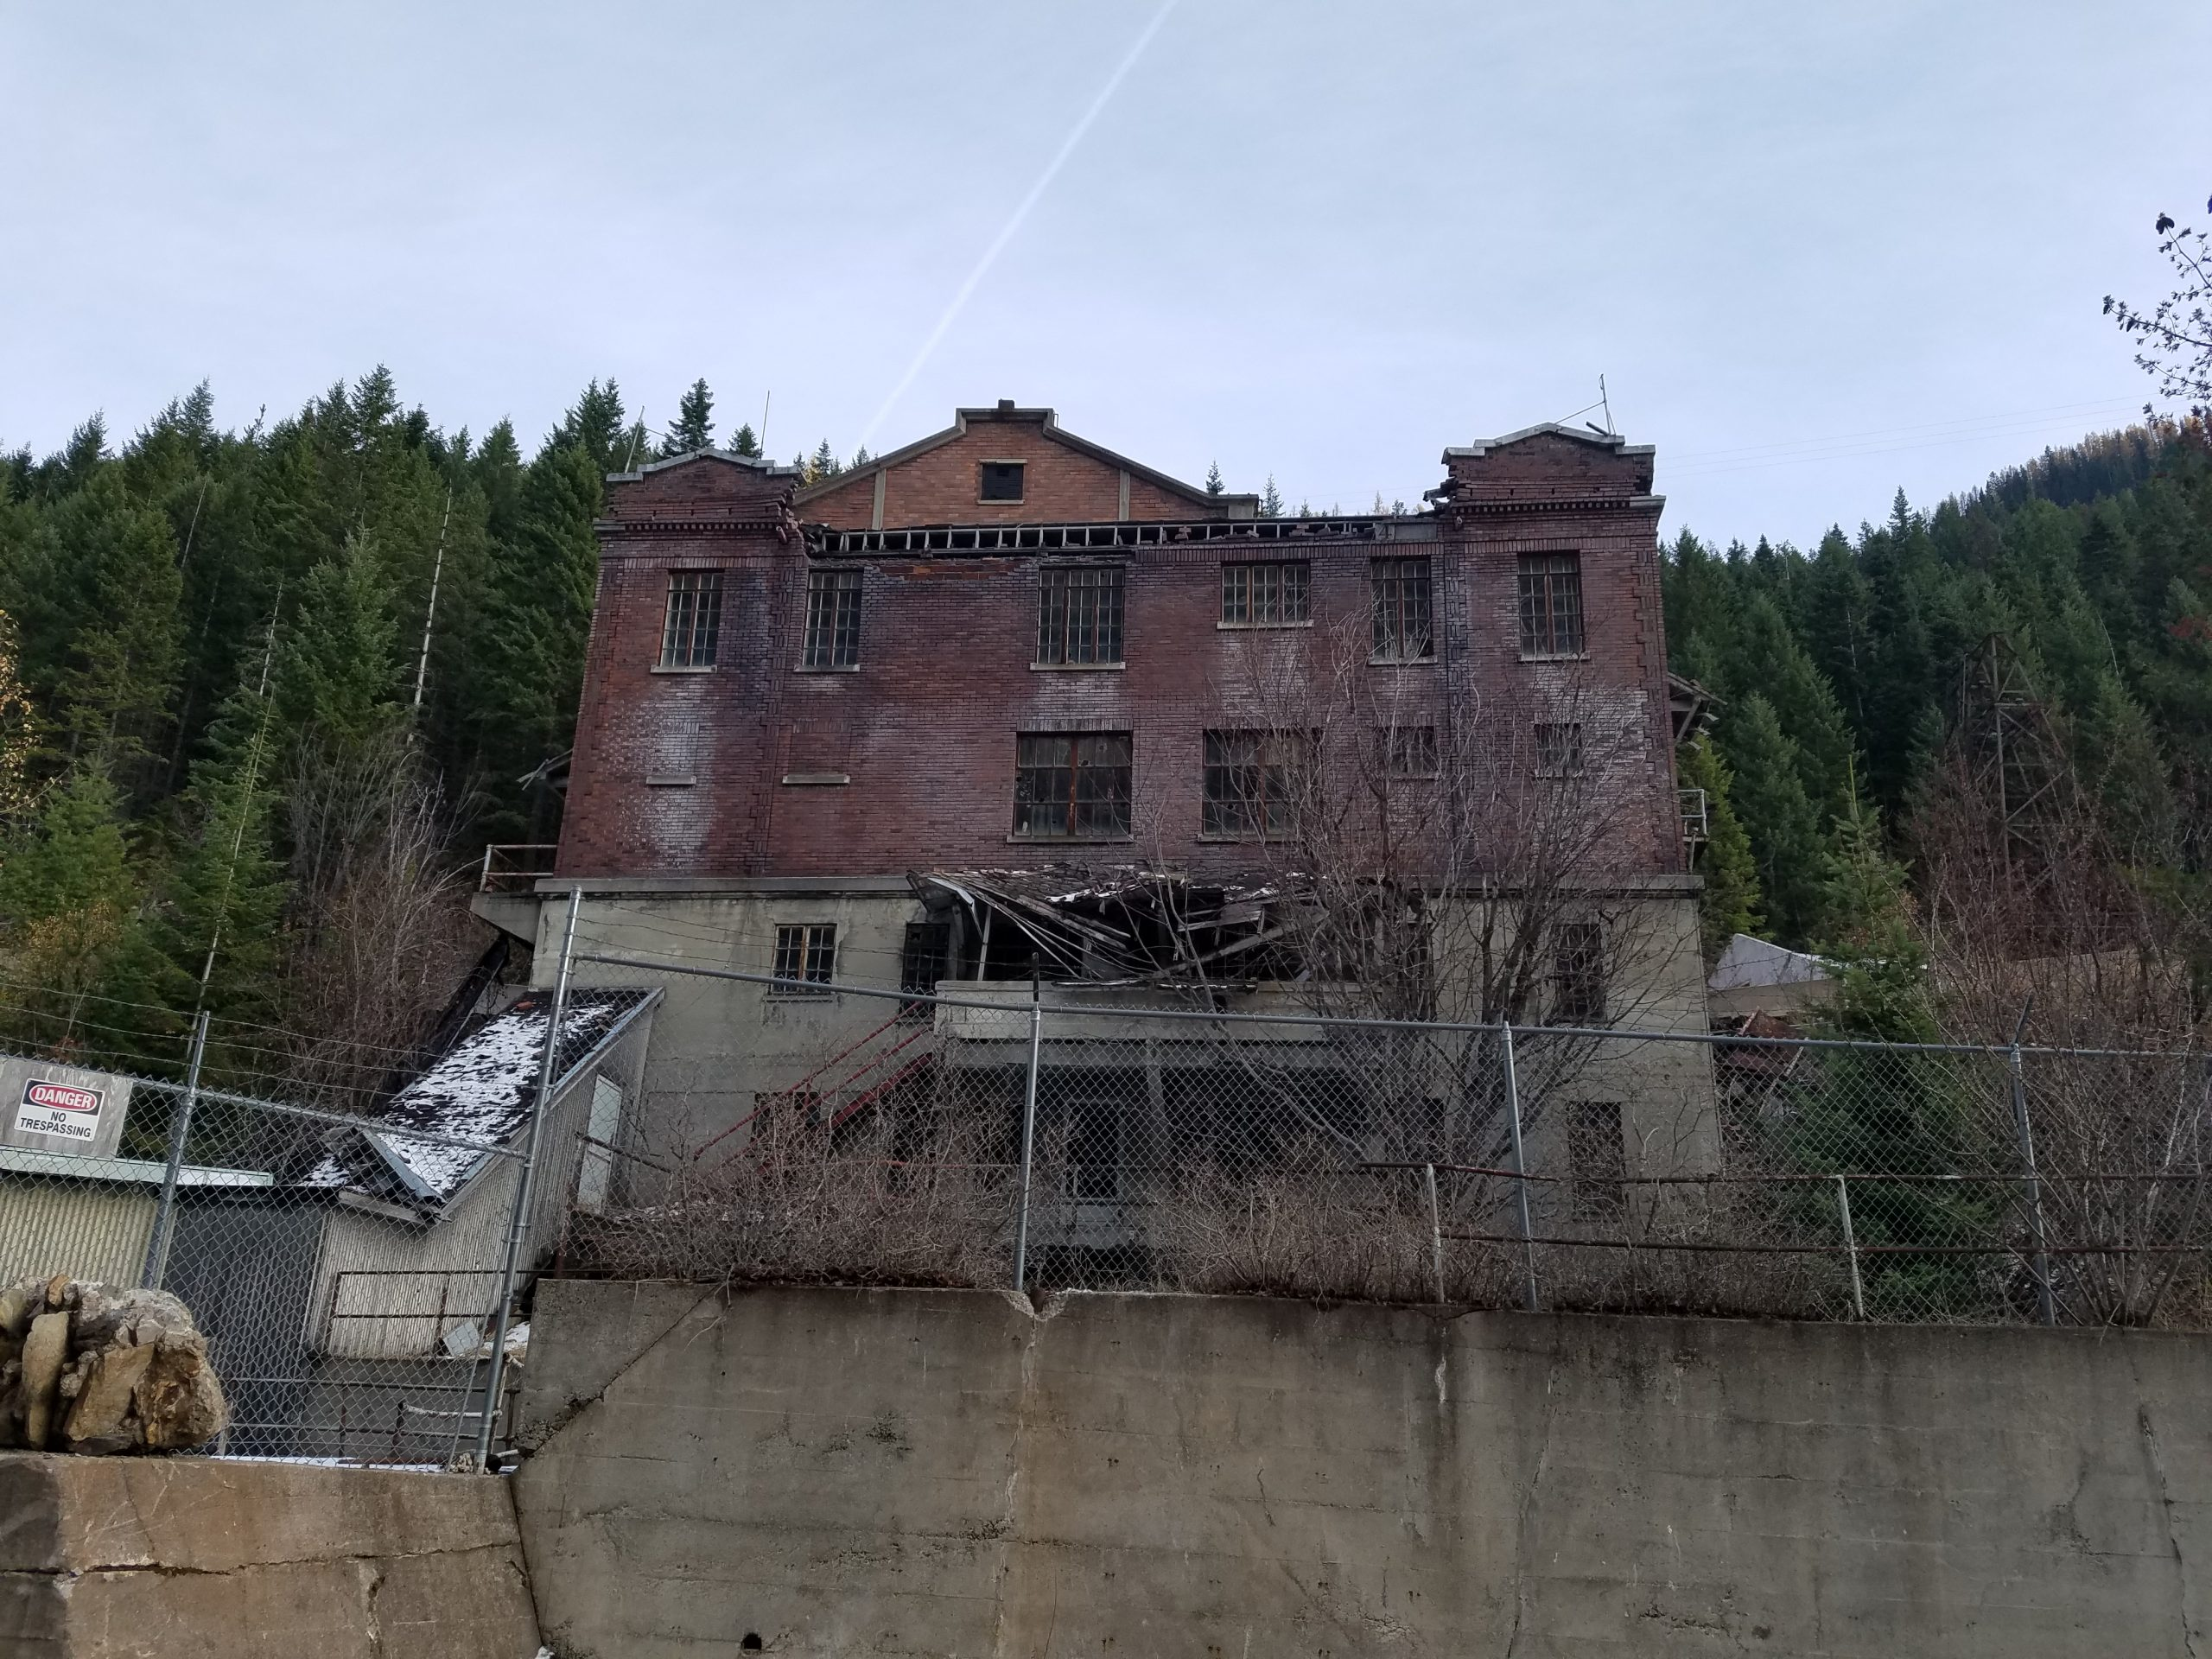 Hecla mine offices, Burke, Idaho